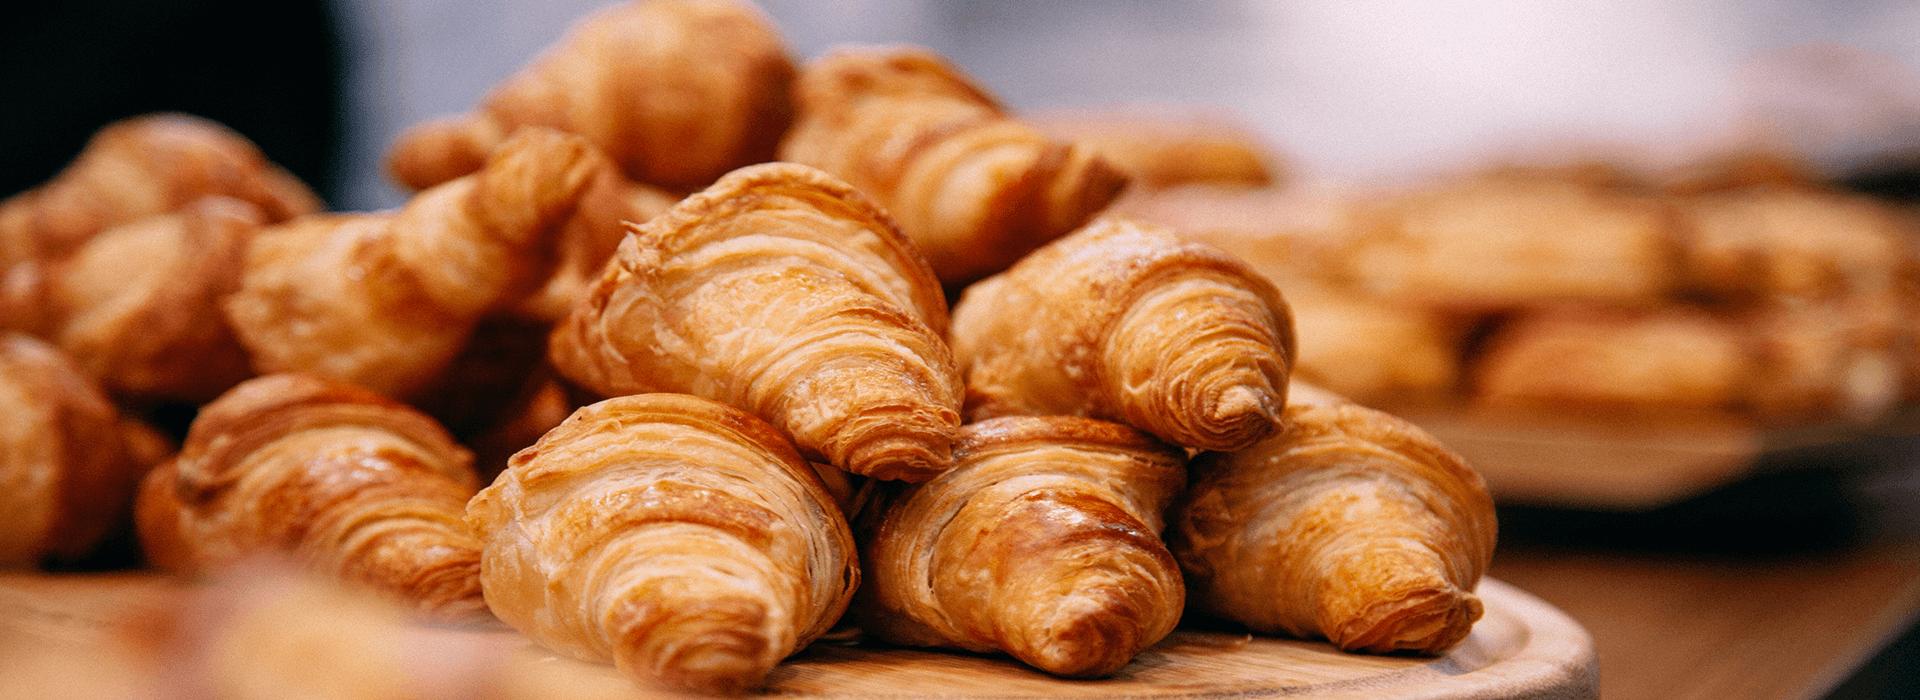 bgs-boulangerie-patisserie-Gilly